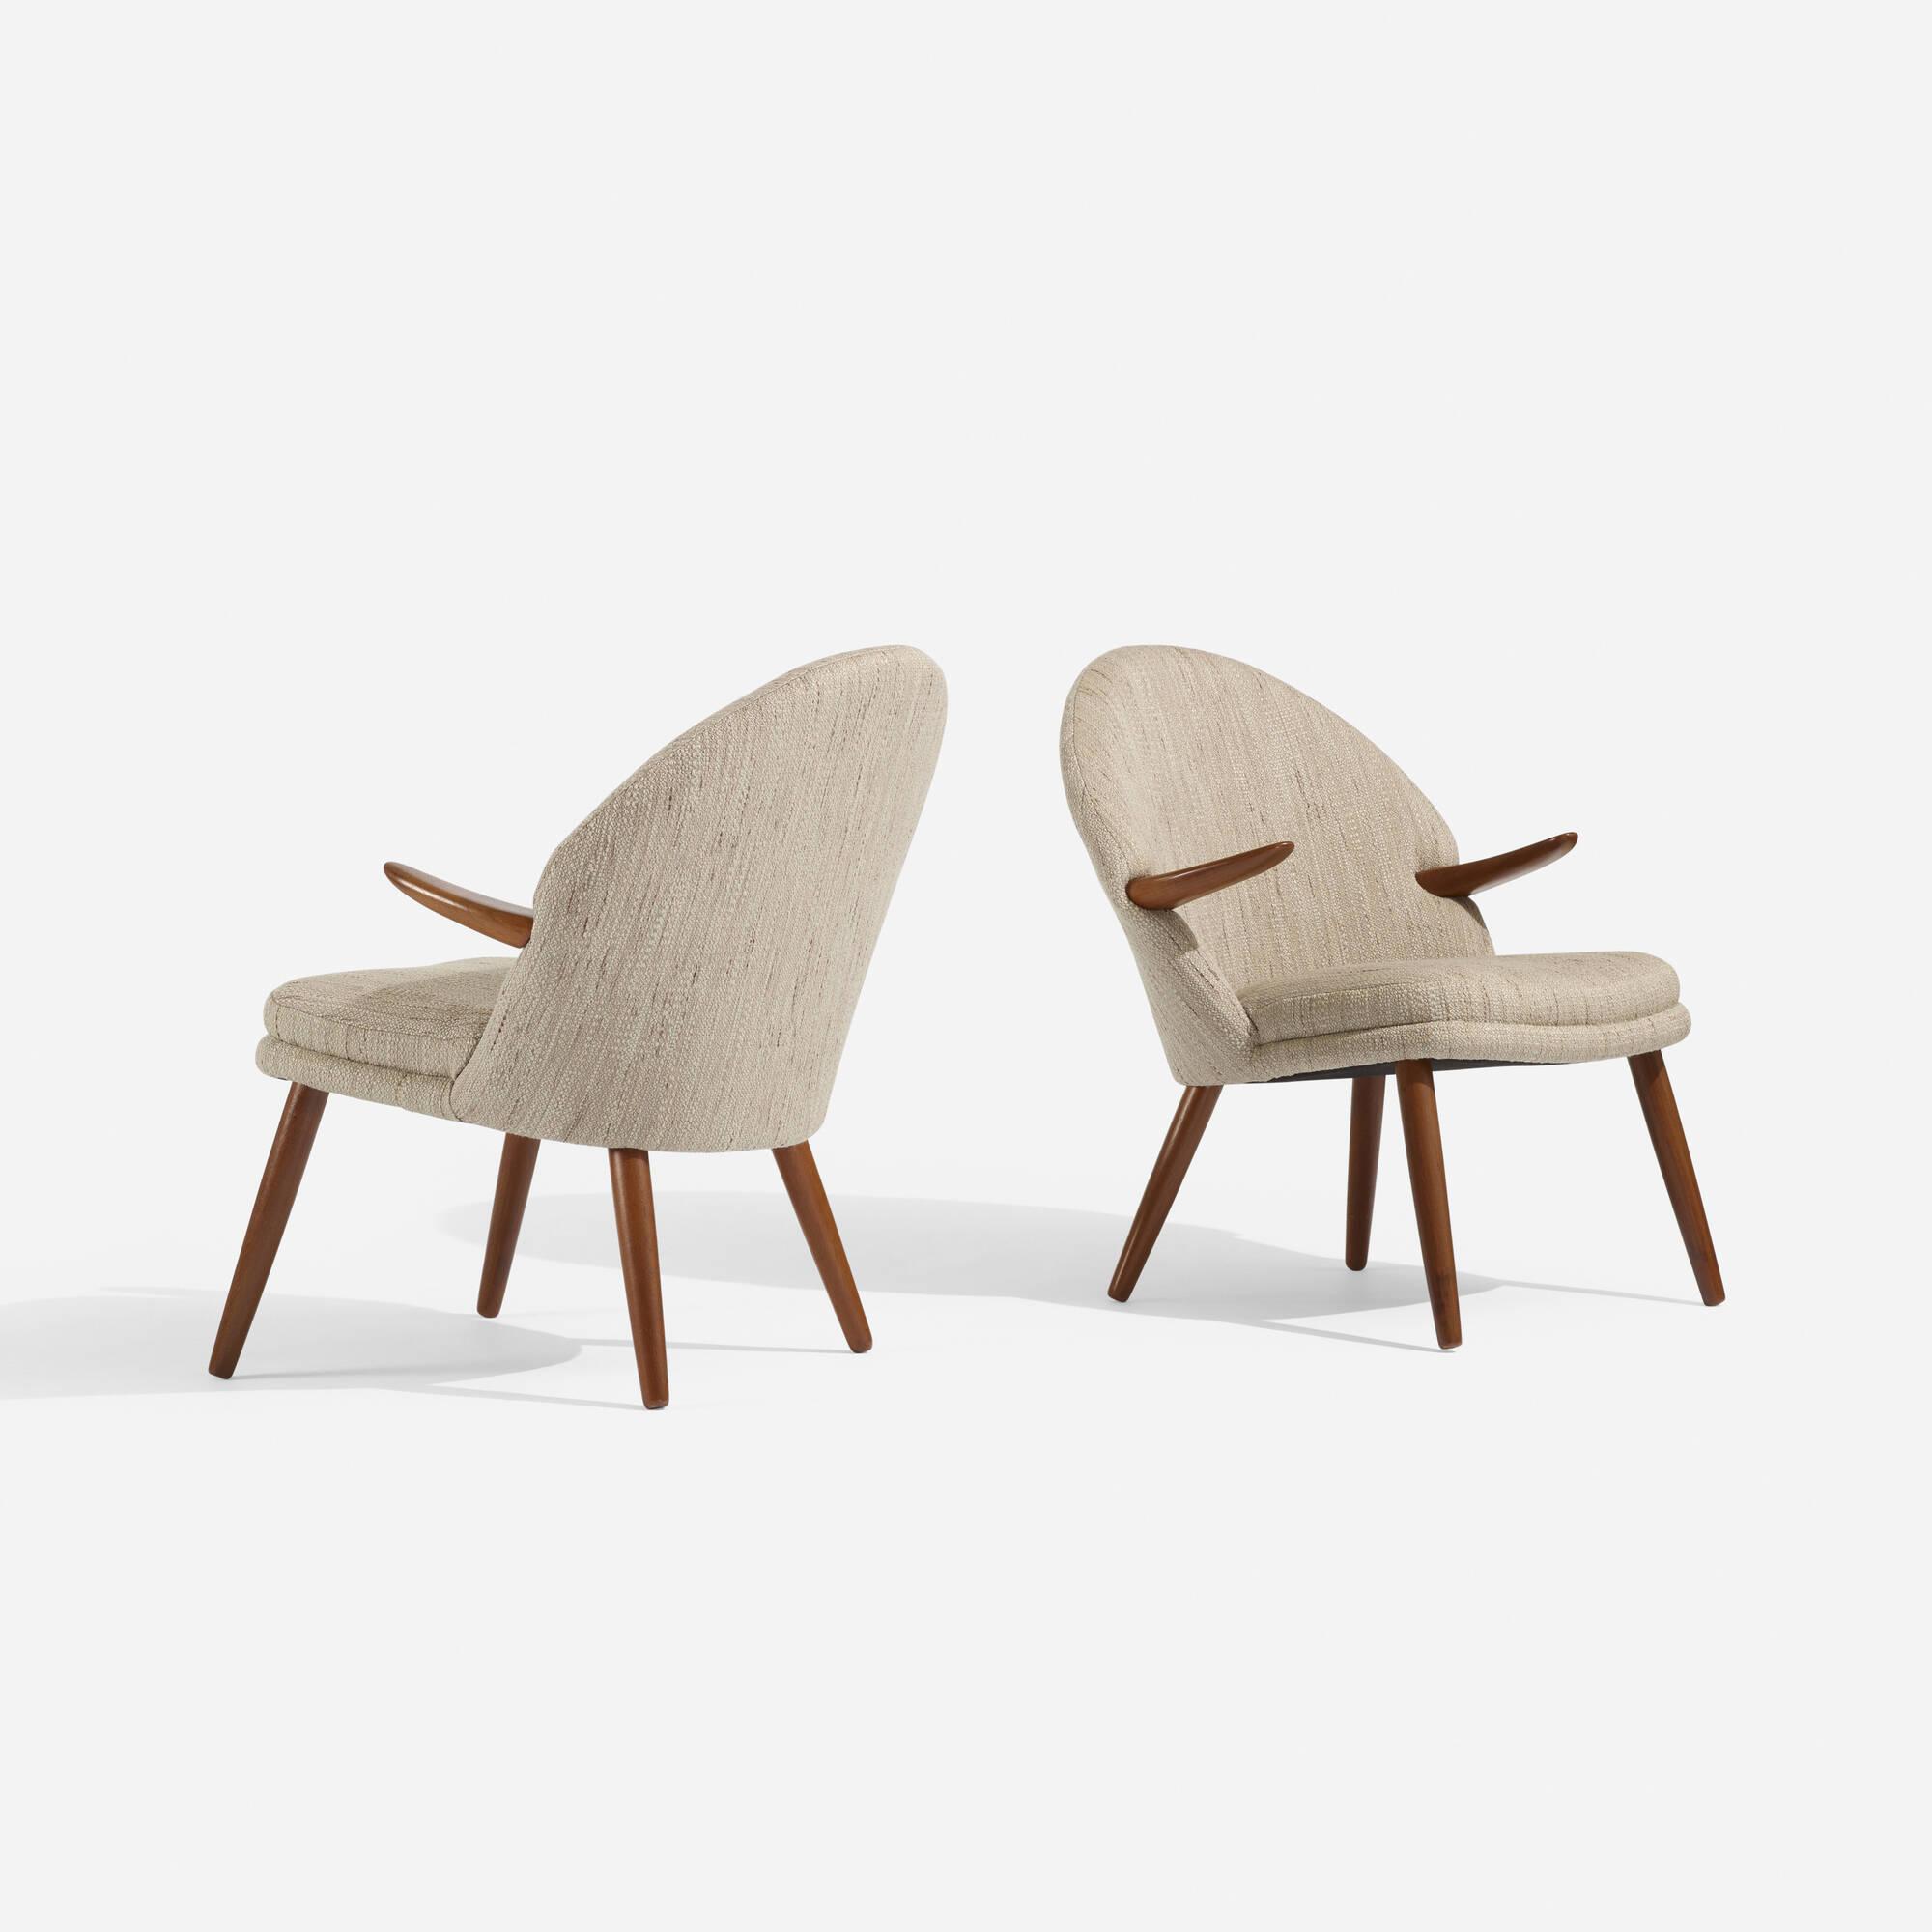 140: Kurt Olsen / lounge chairs, pair (2 of 3)